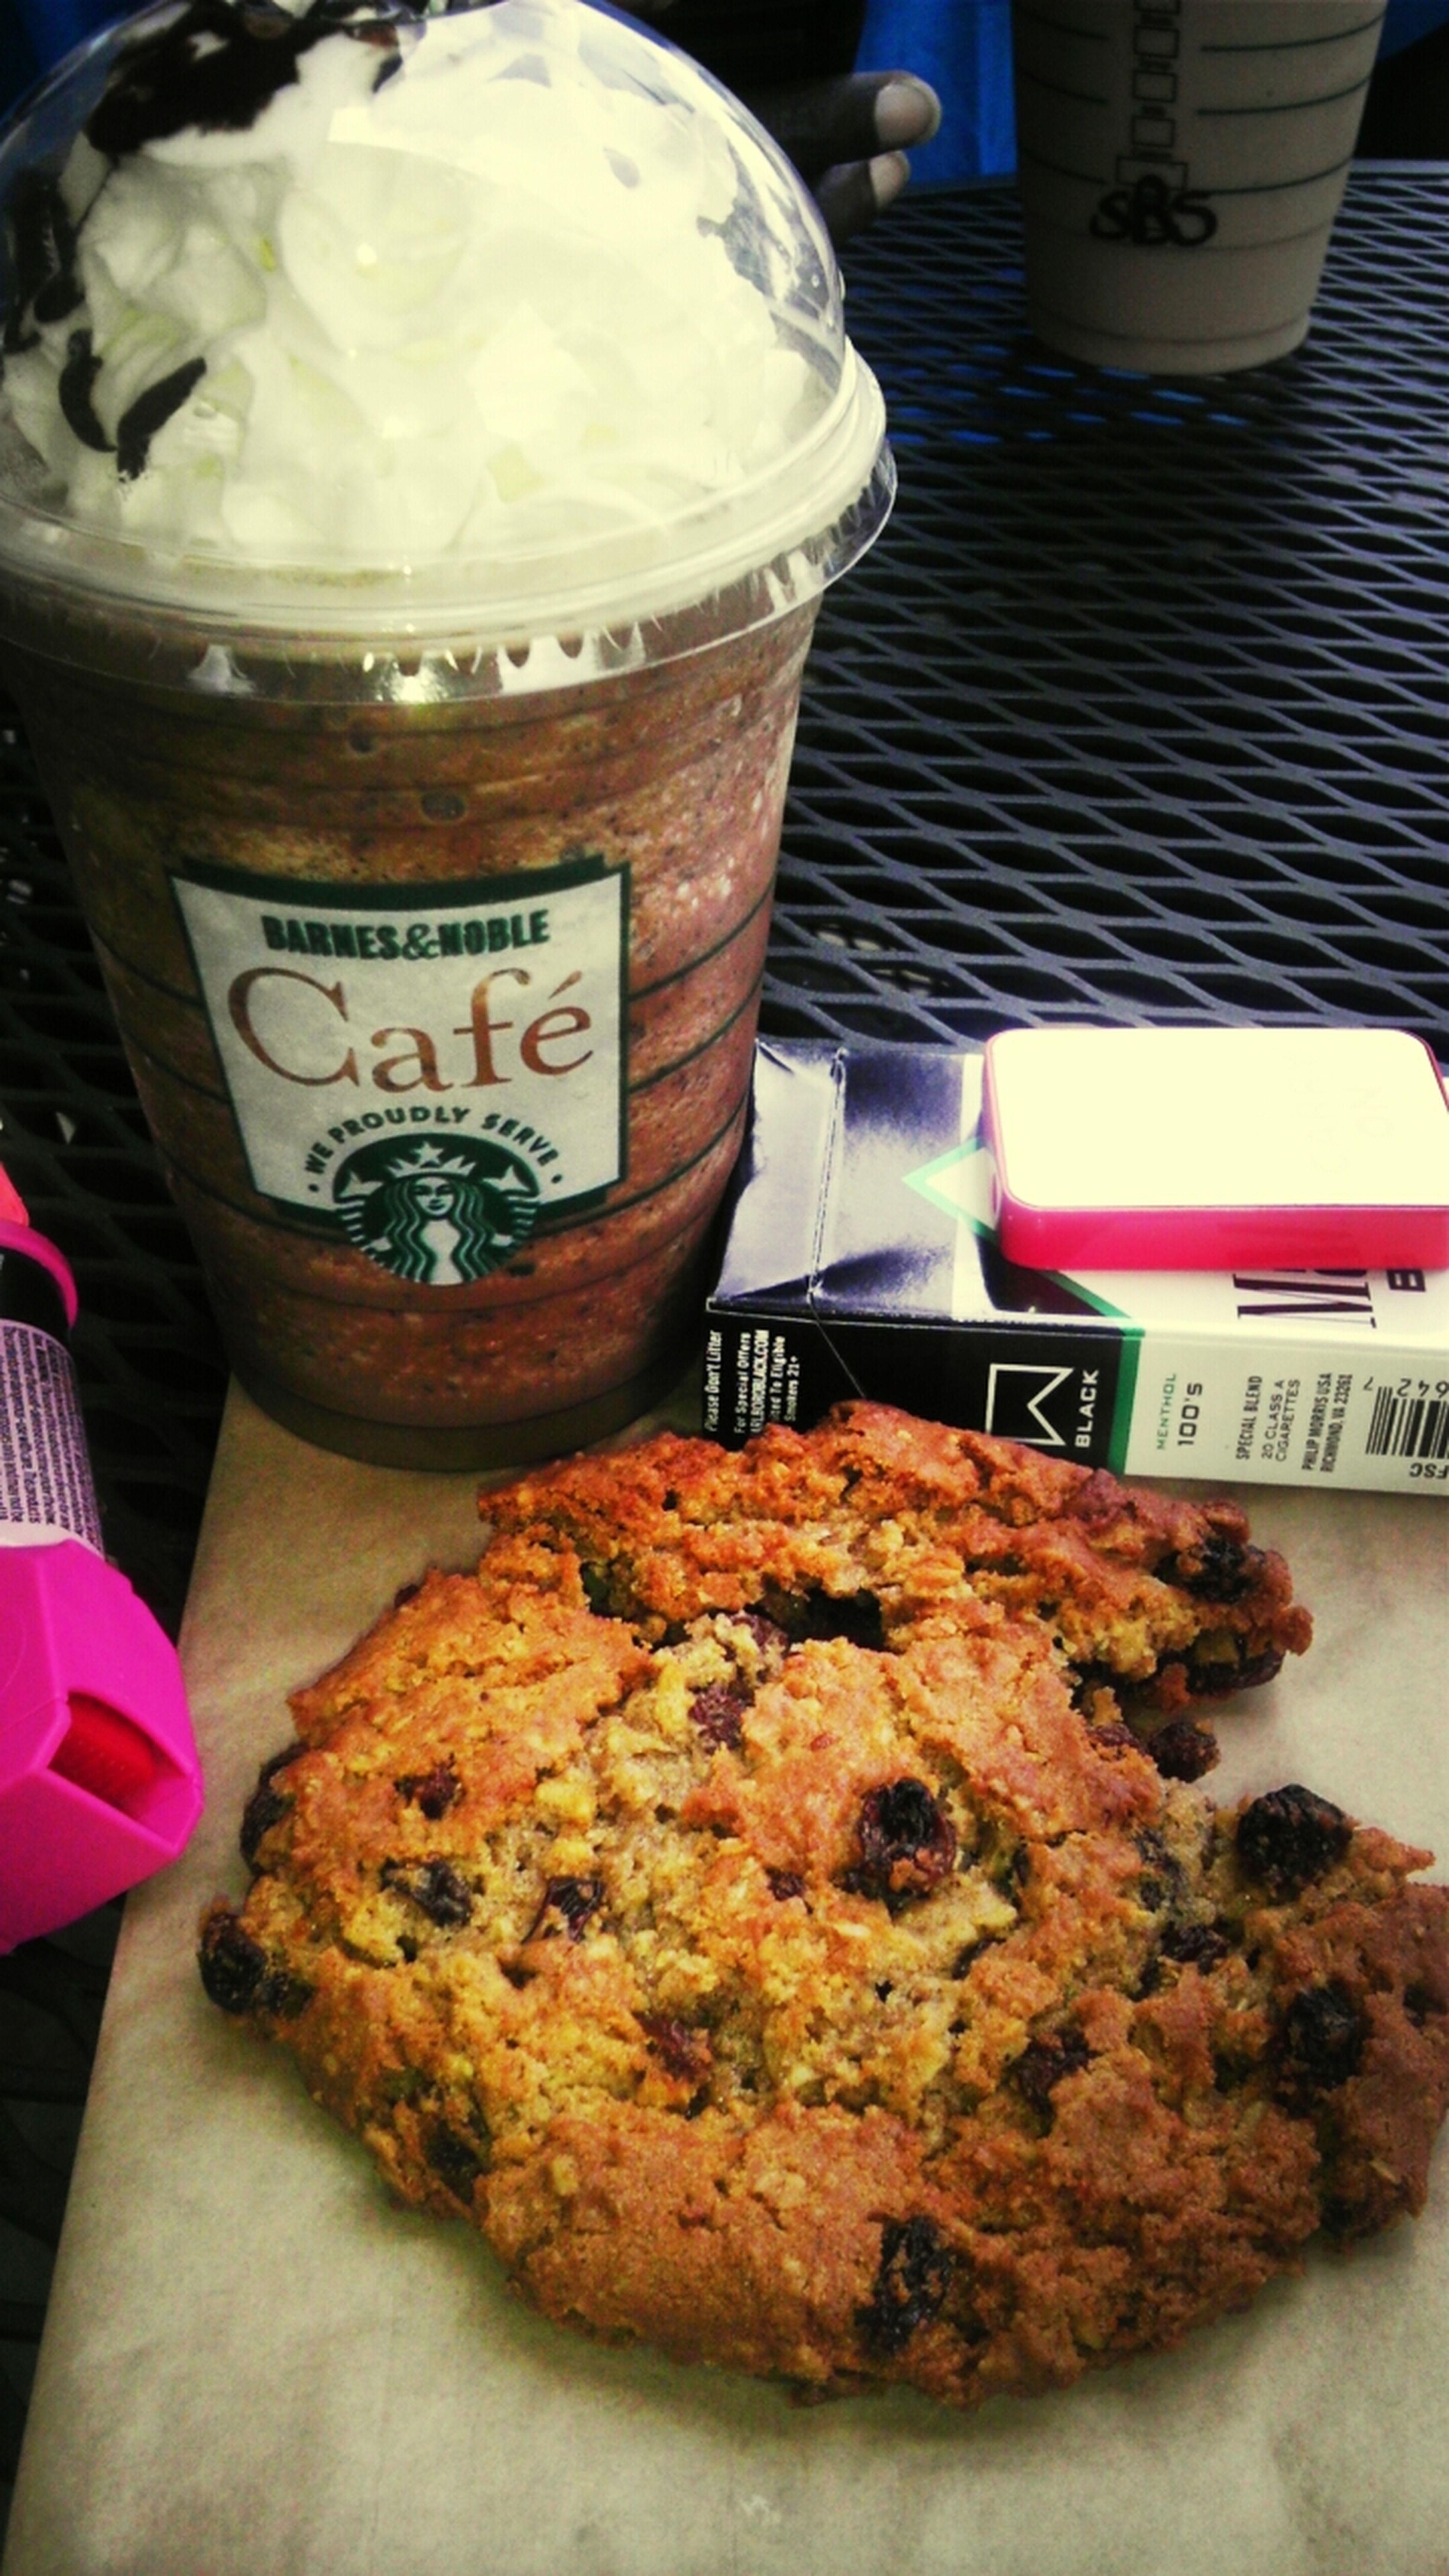 Starbucks junkie Starbucks